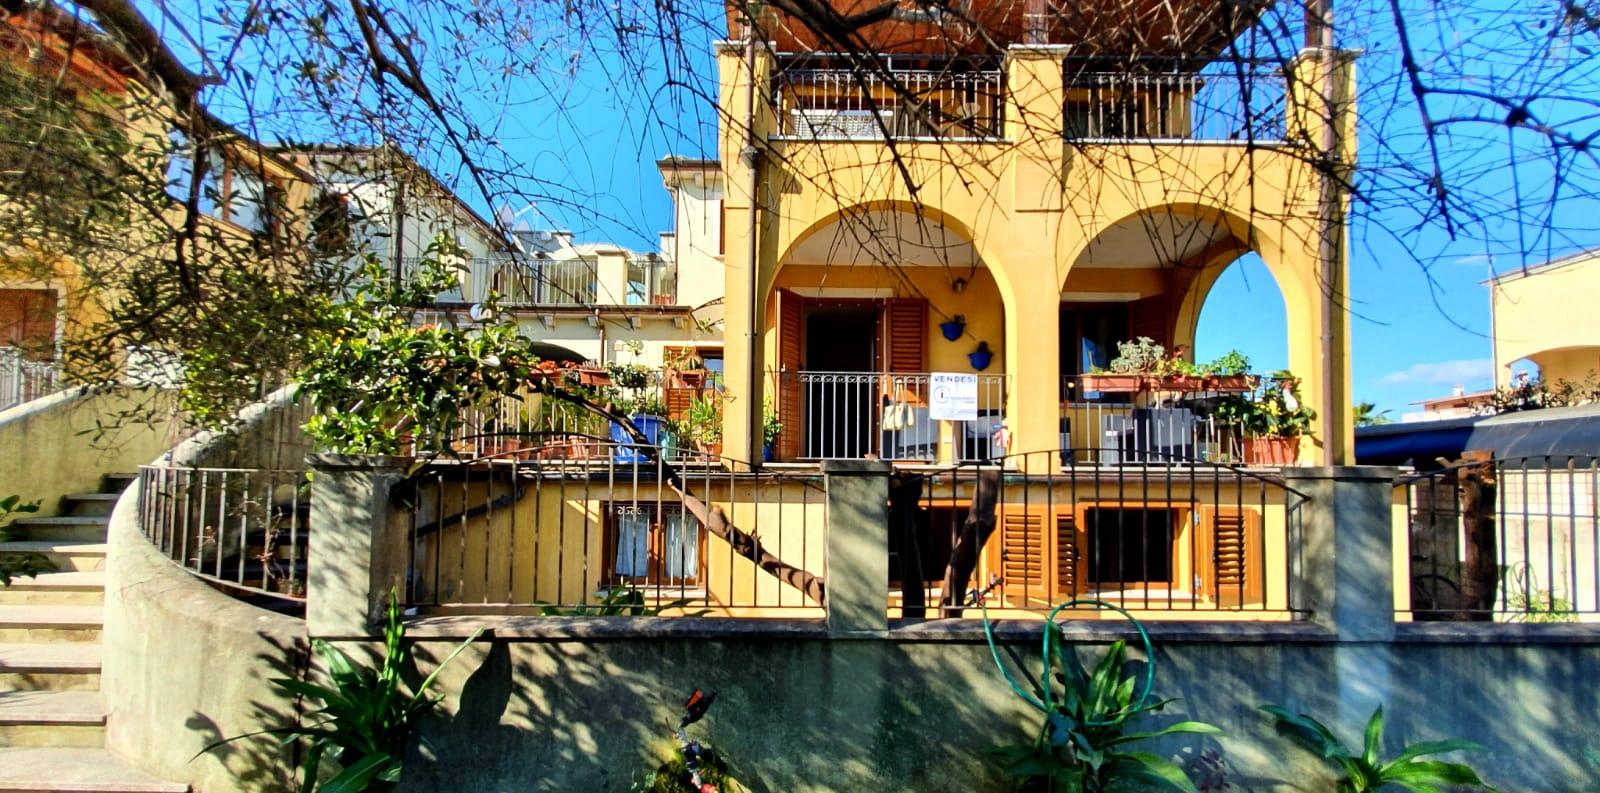 Appartamento in vendita a Tortolì, 3 locali, Trattative riservate | PortaleAgenzieImmobiliari.it